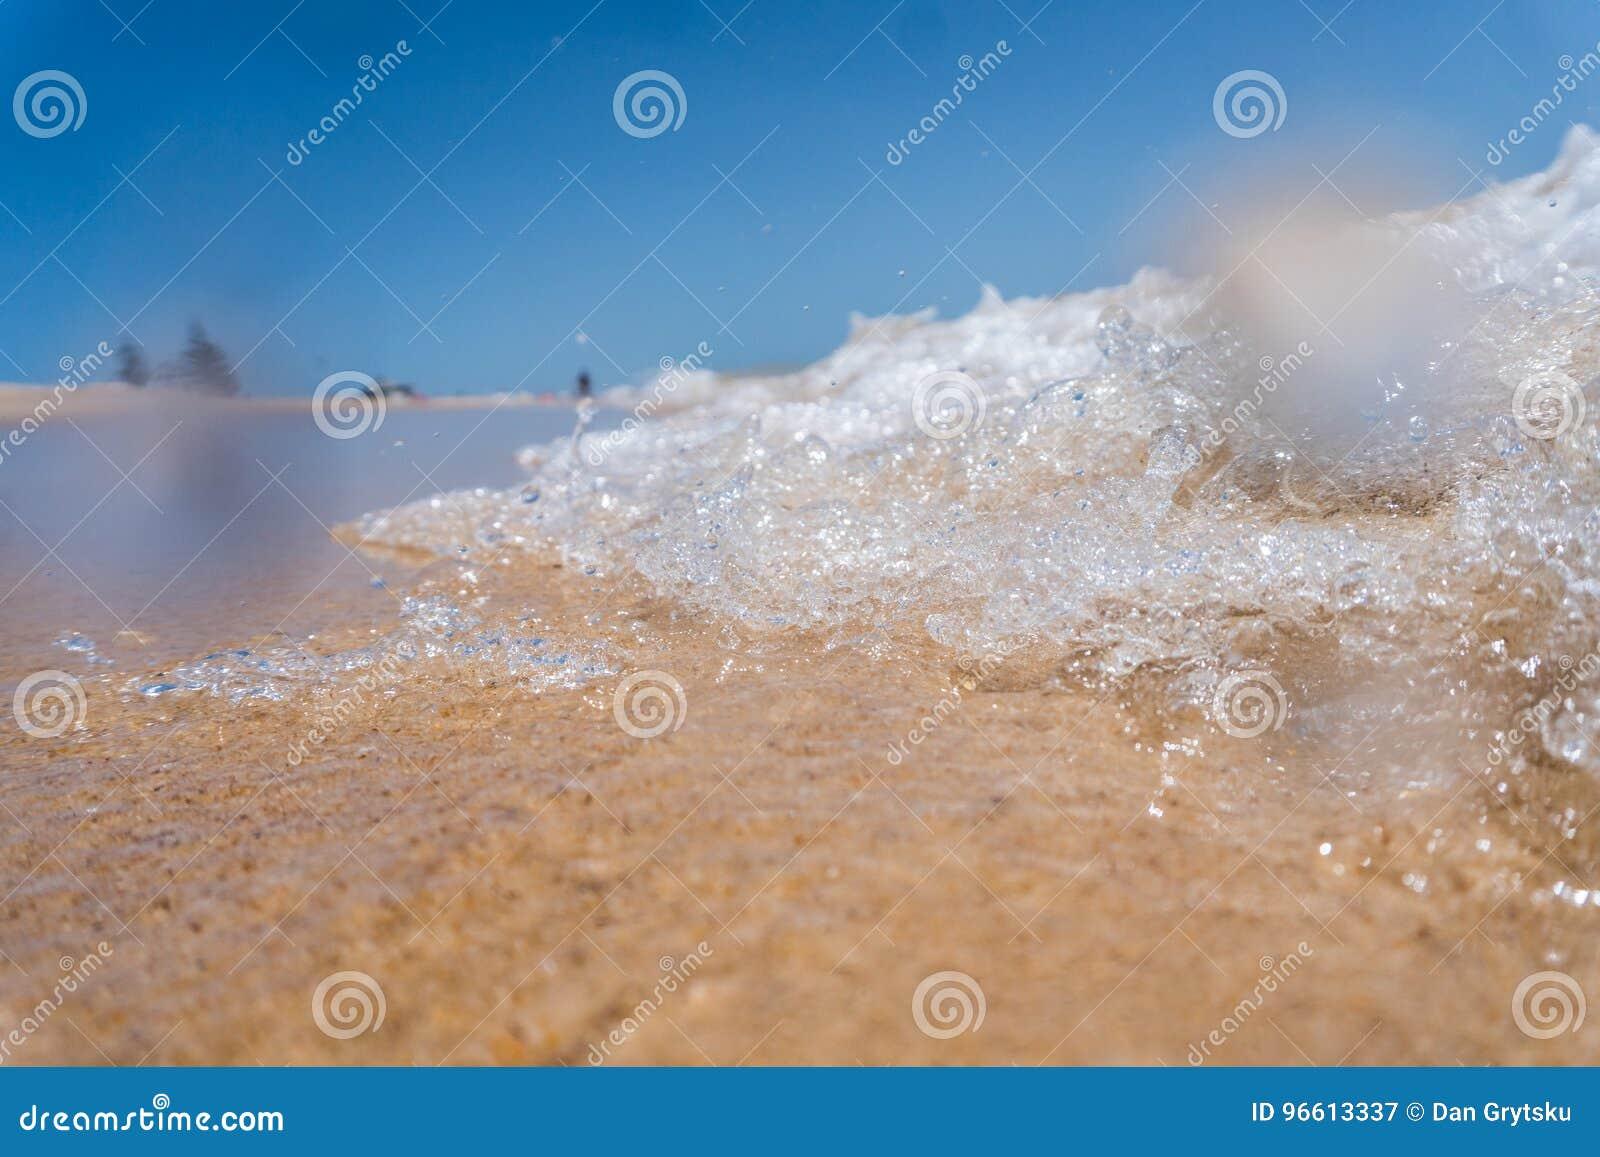 Sea wave close up near beach on sand